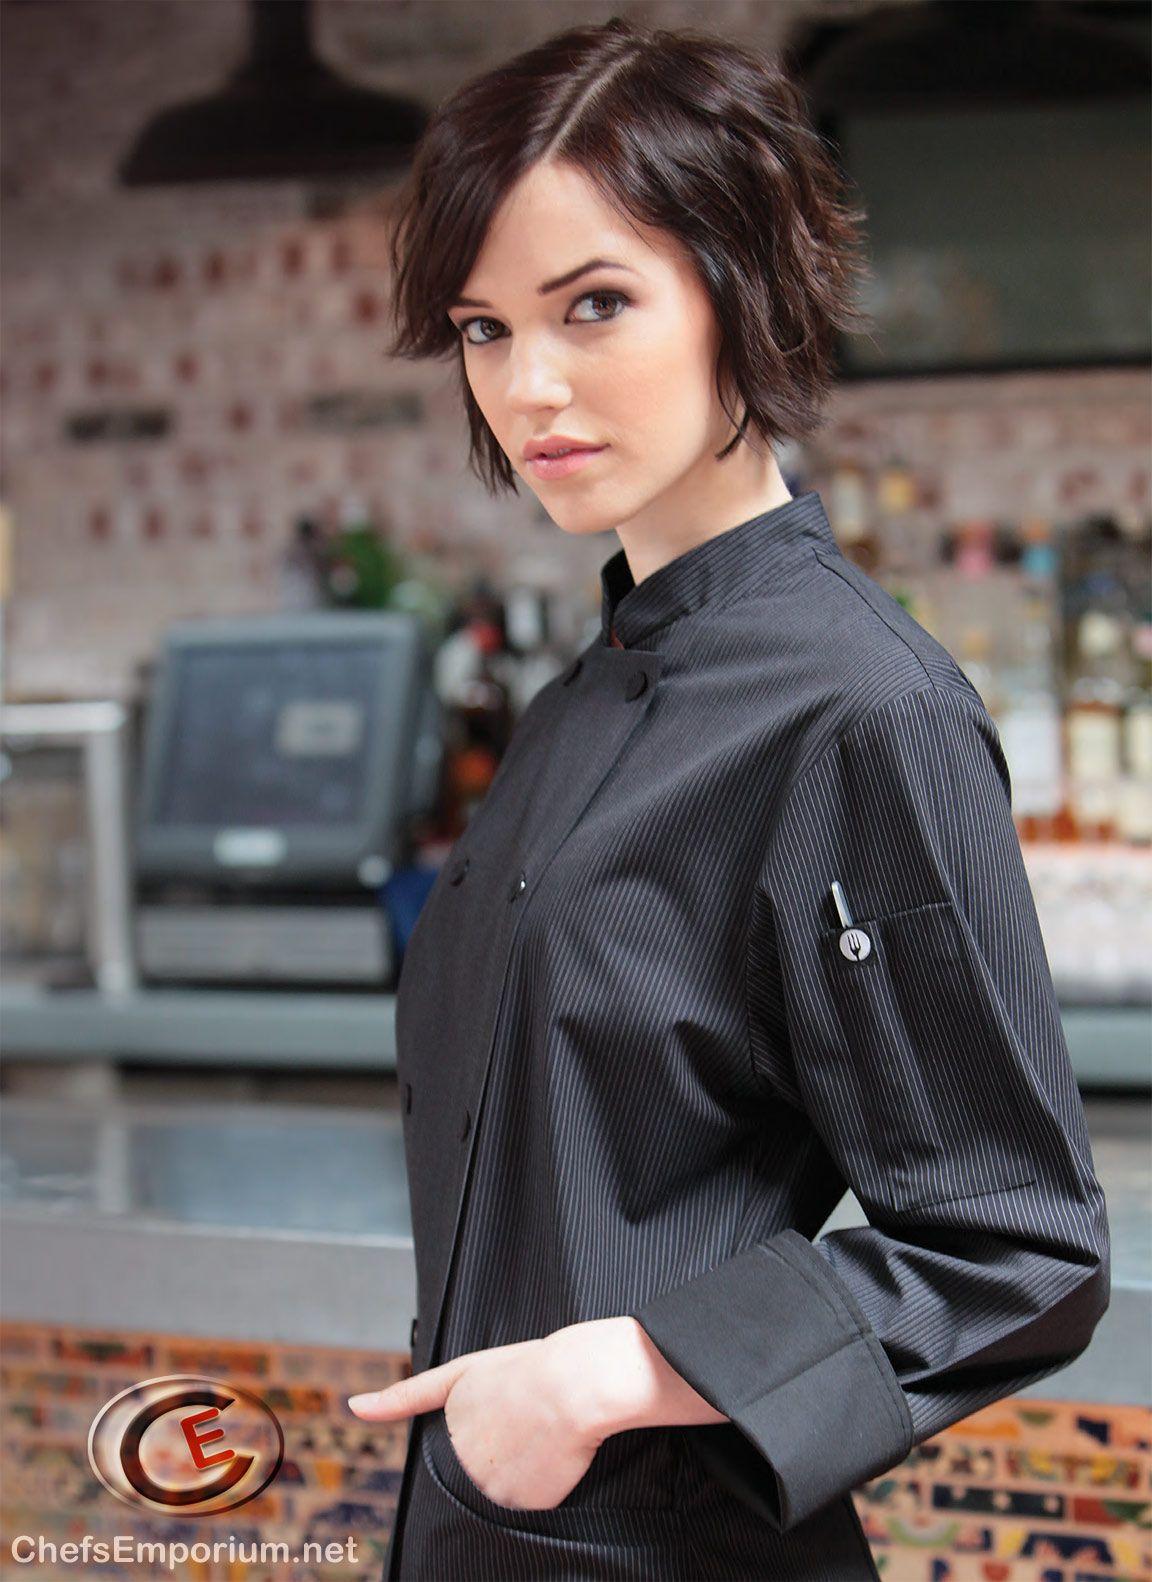 White apron ladies - Ladies Modern Black White Pinstripe Chef Coat Hip Culinary Fashion For The Female